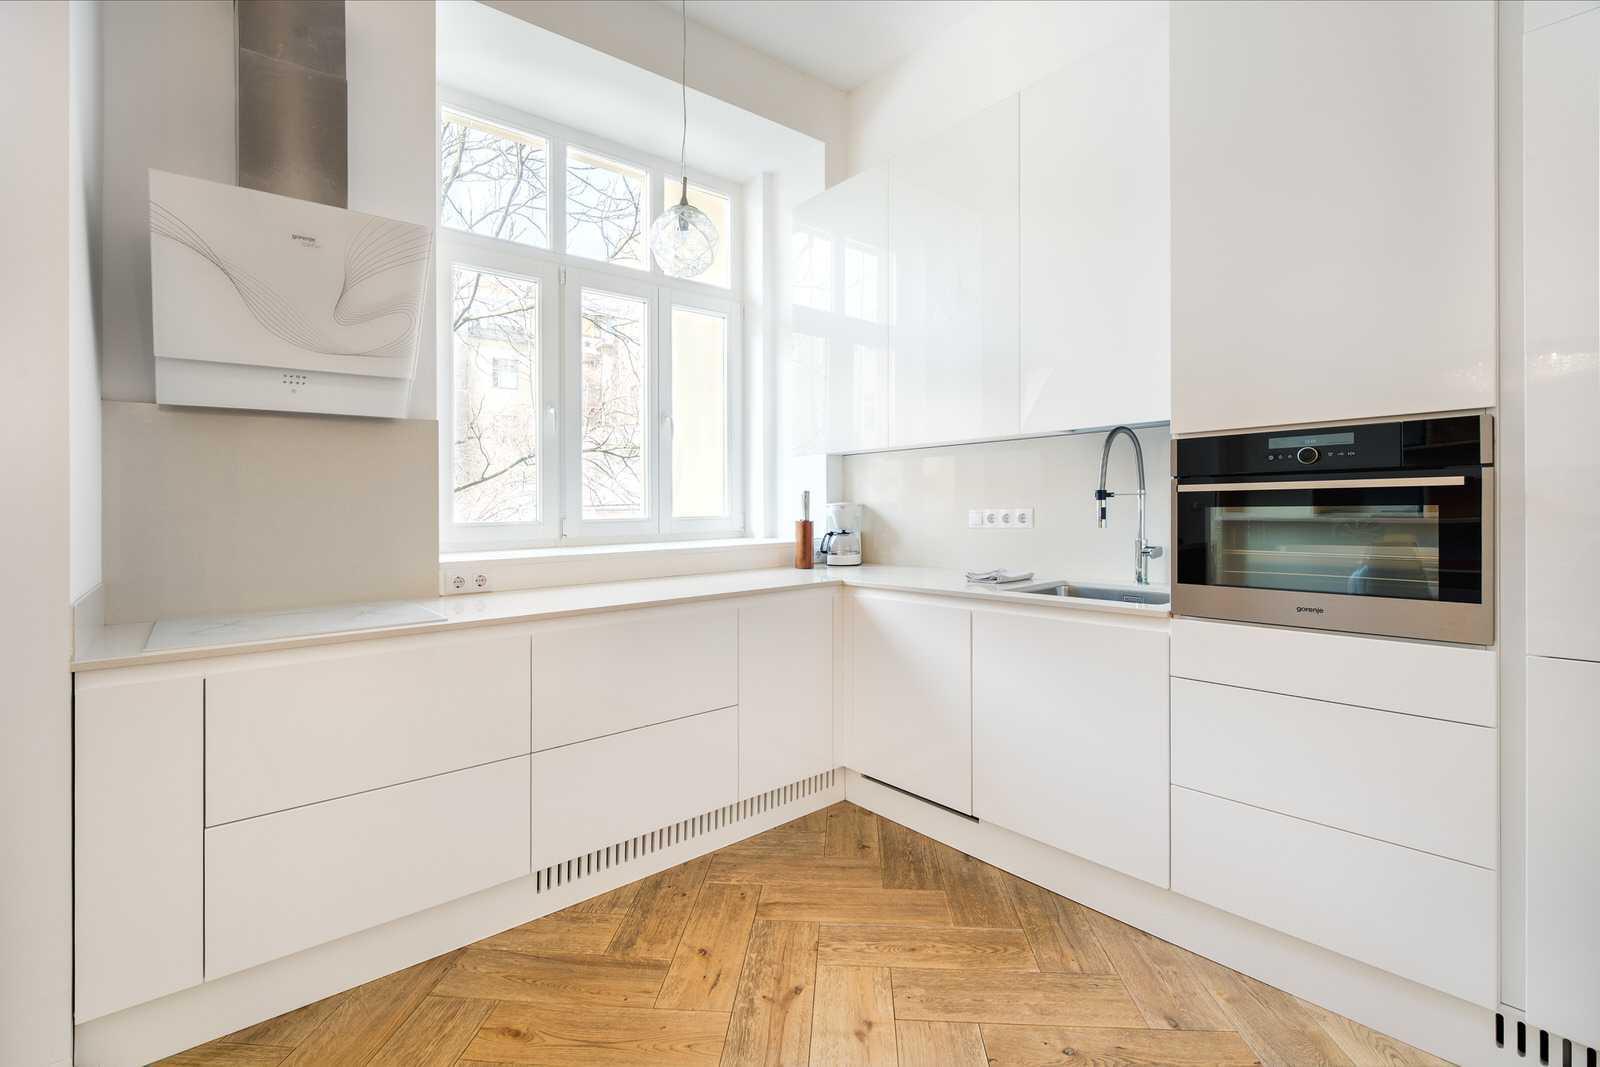 Ljubljana 2-bedroom Beethovnova apartment's fully equipped modern kitchen